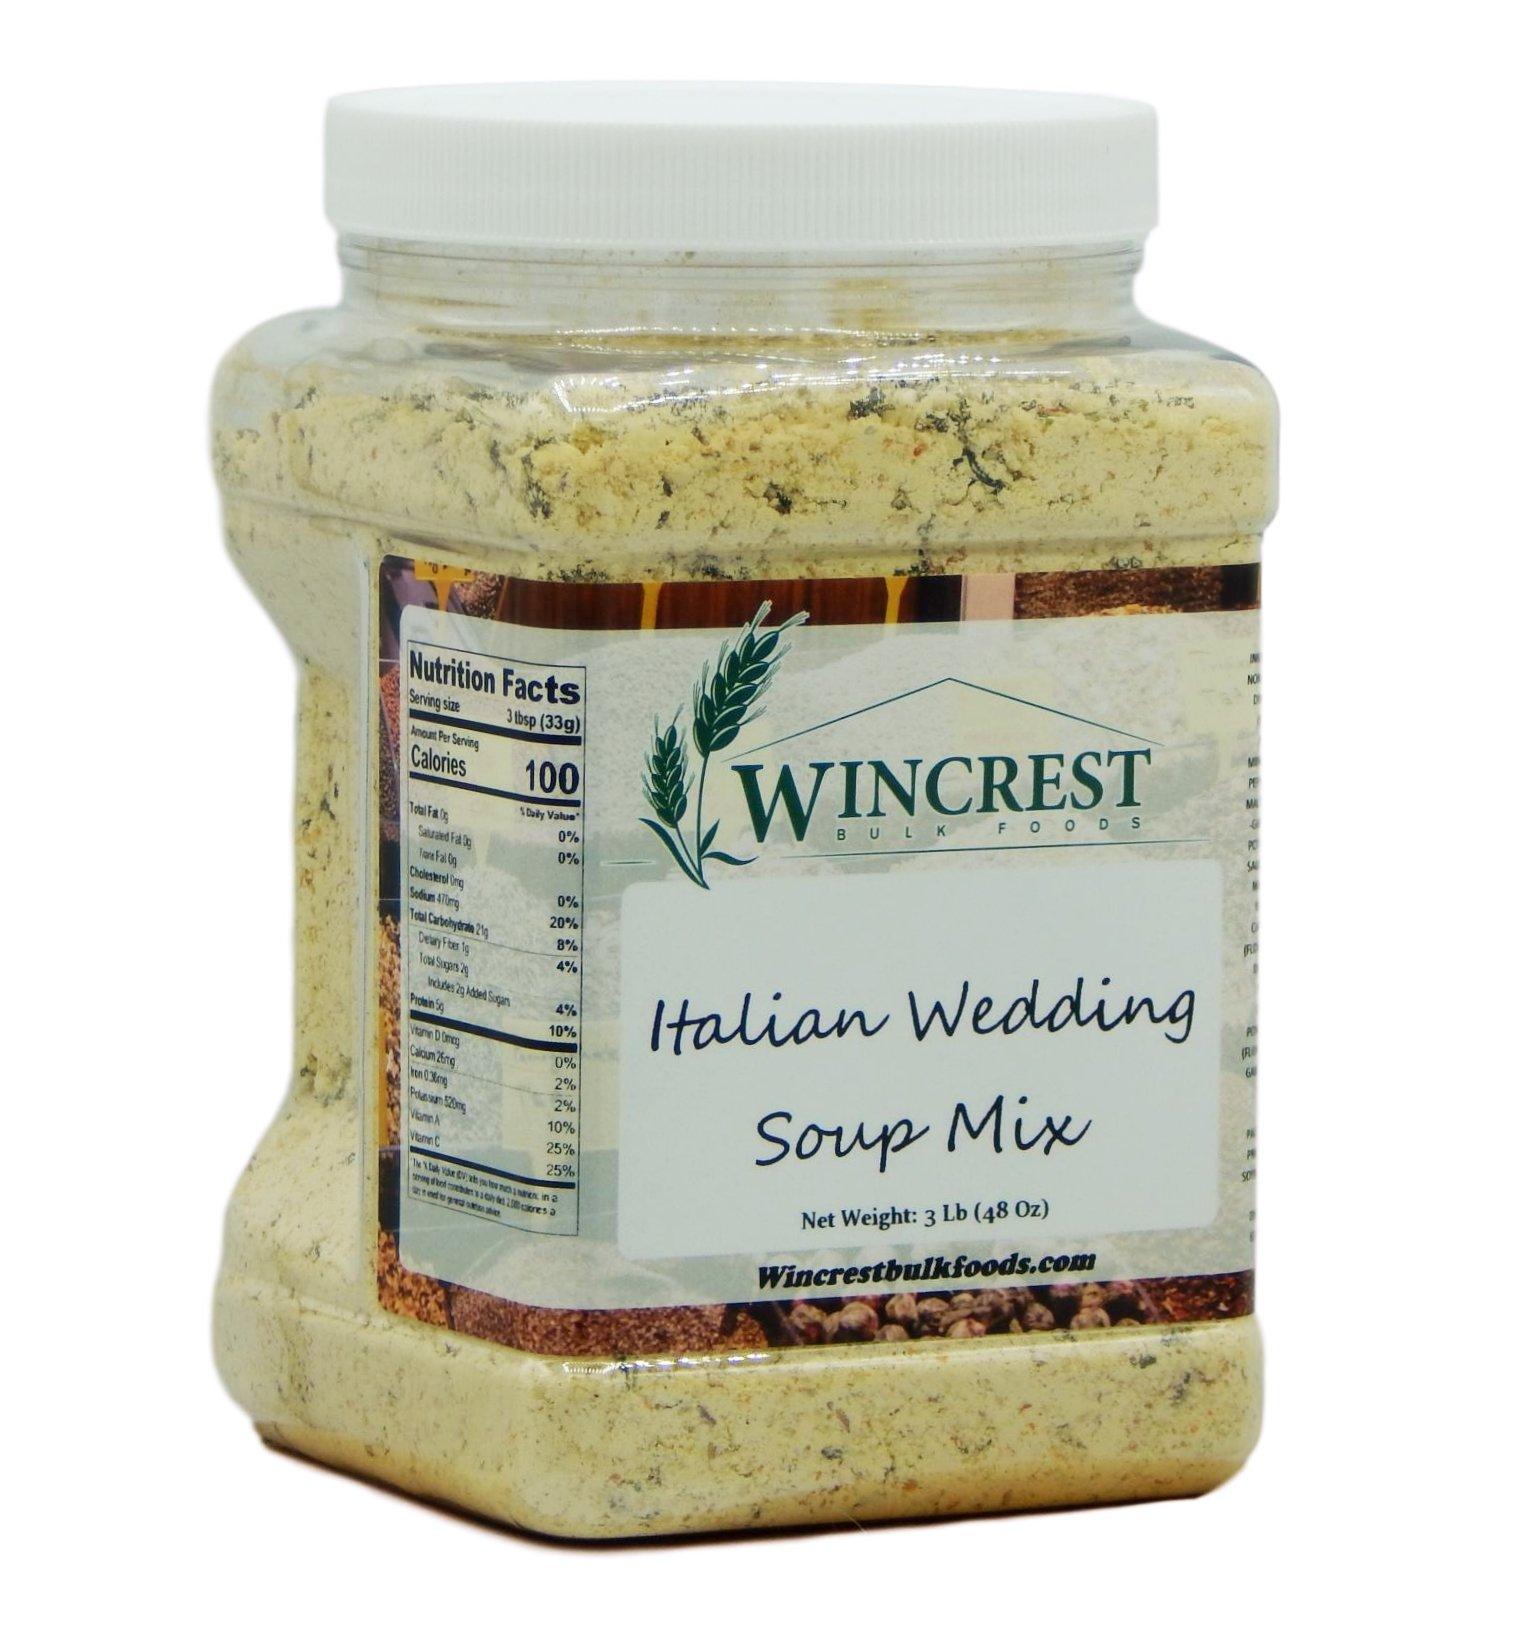 Italian Wedding Soup Mix - 2.5 Lb Tub